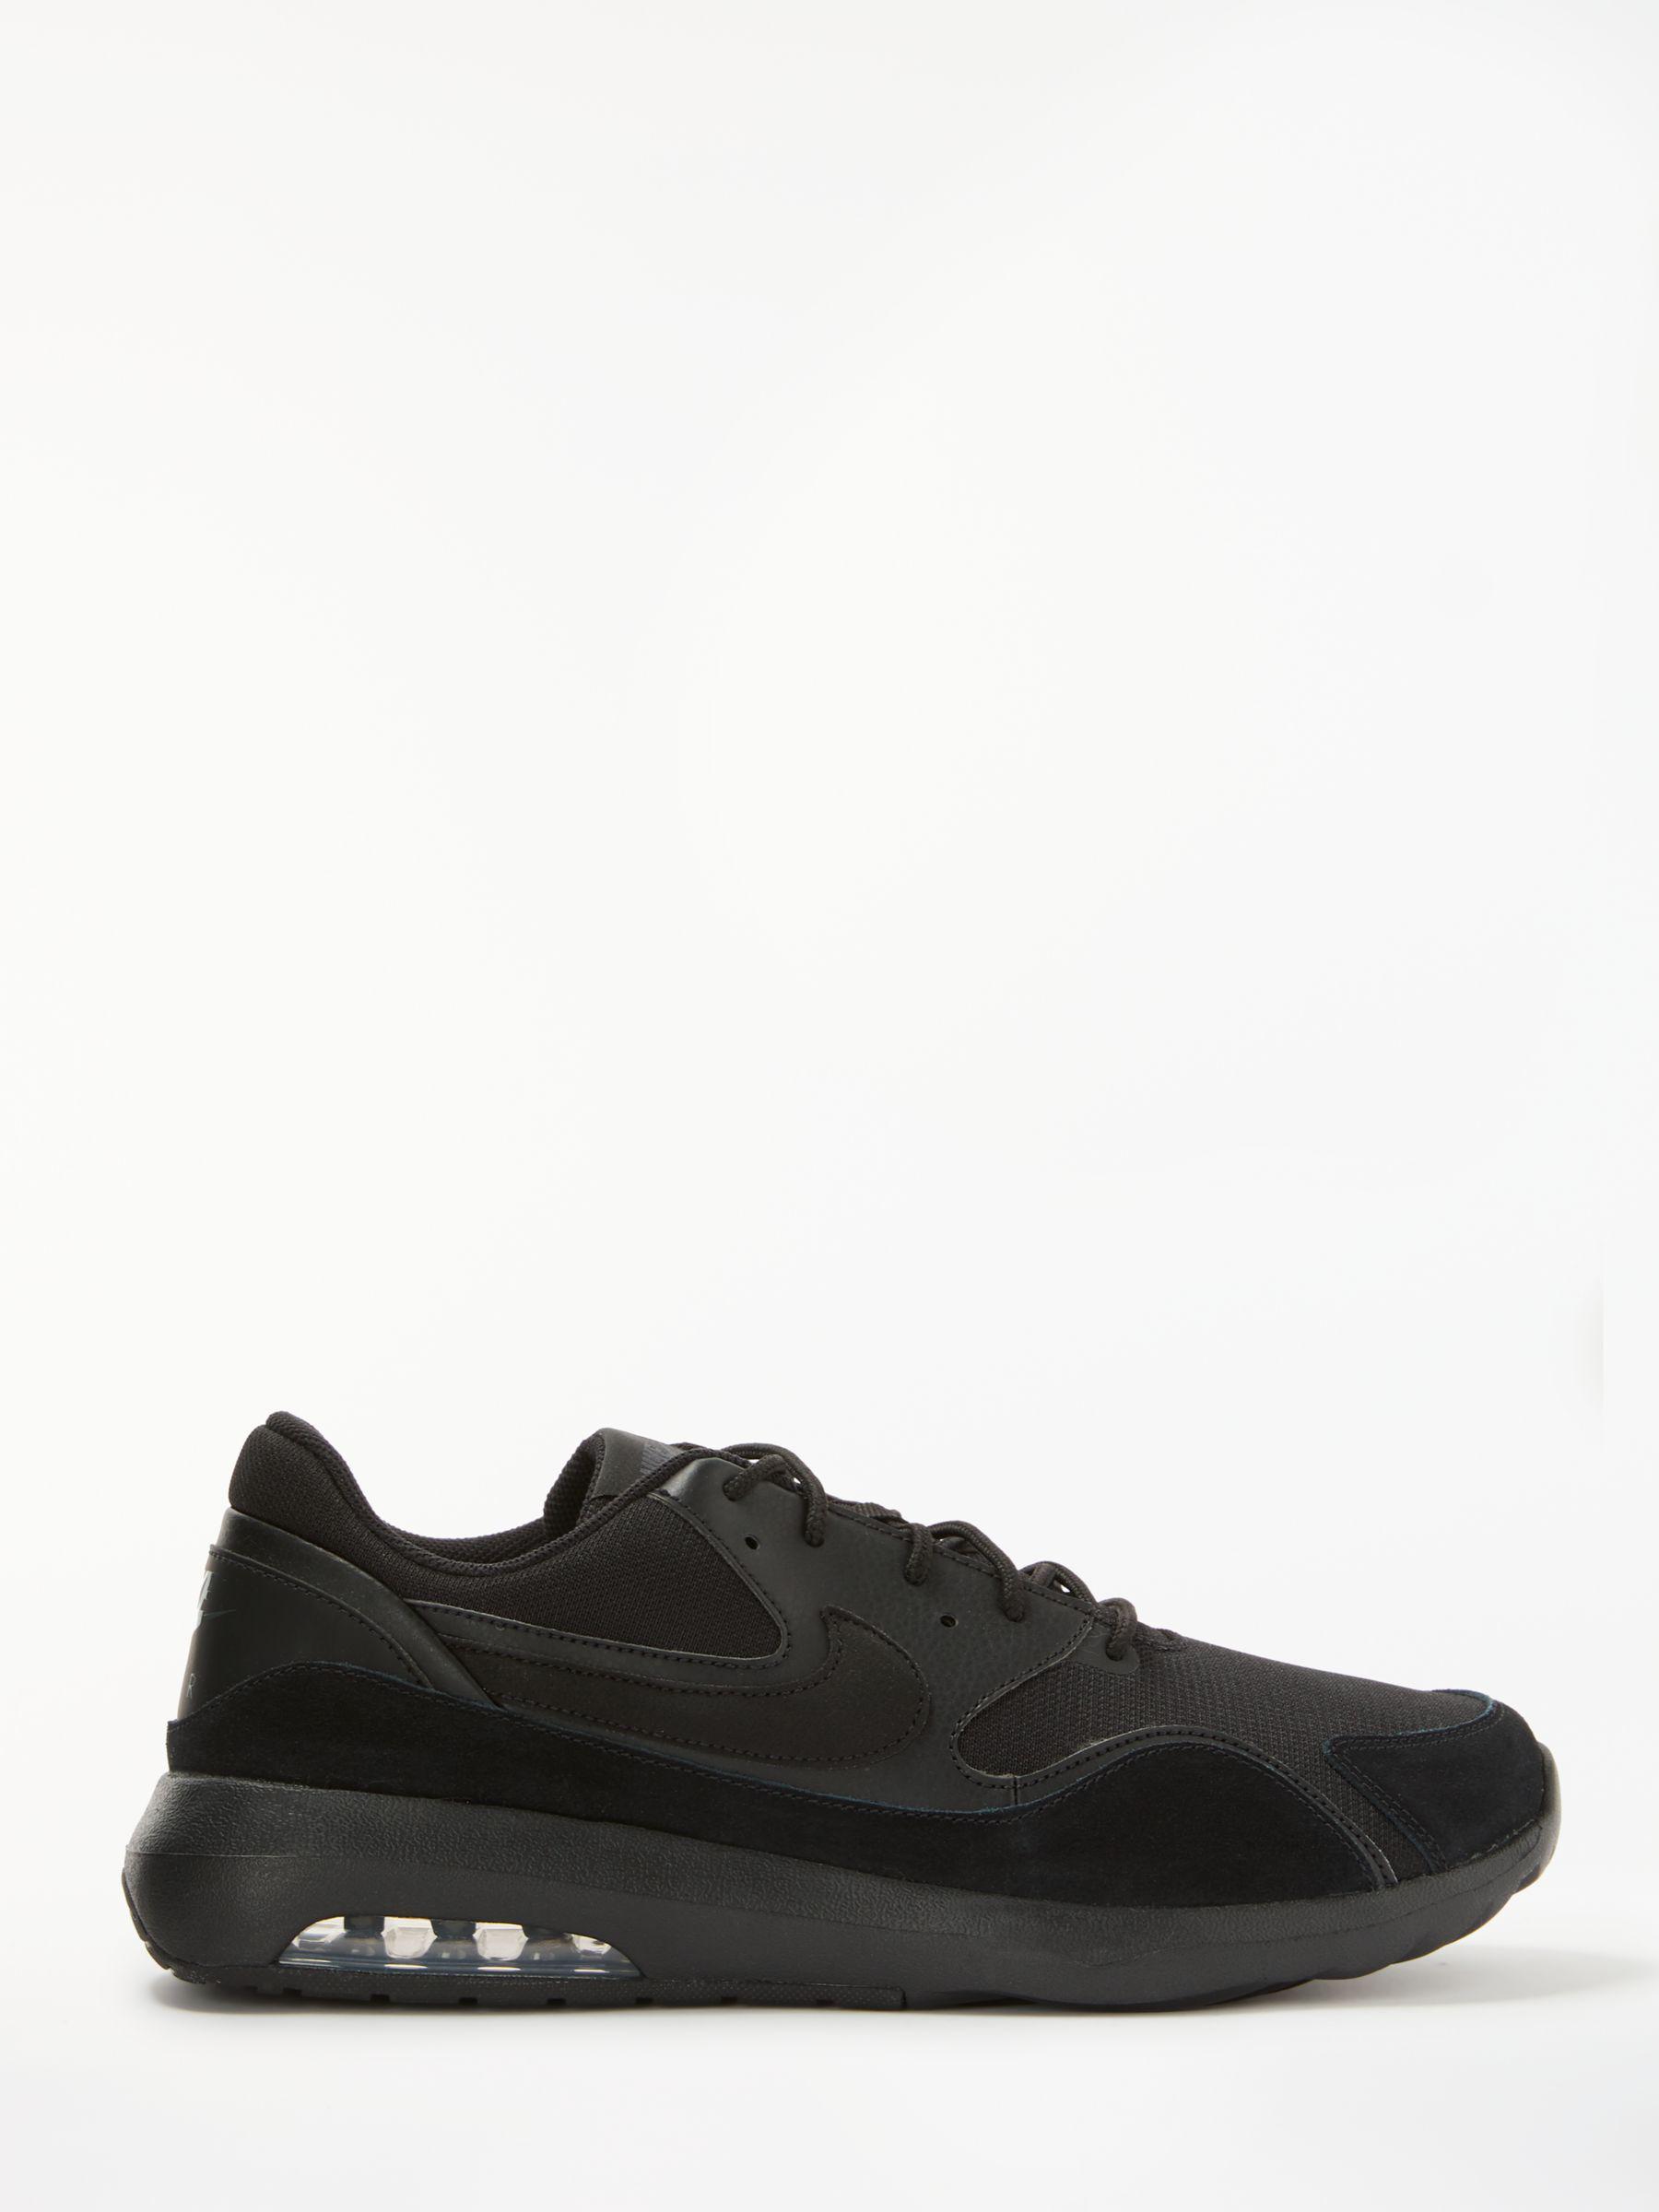 2e713d2fb779 Nike Air Max Nostalgic Men s Trainers in Black for Men - Lyst